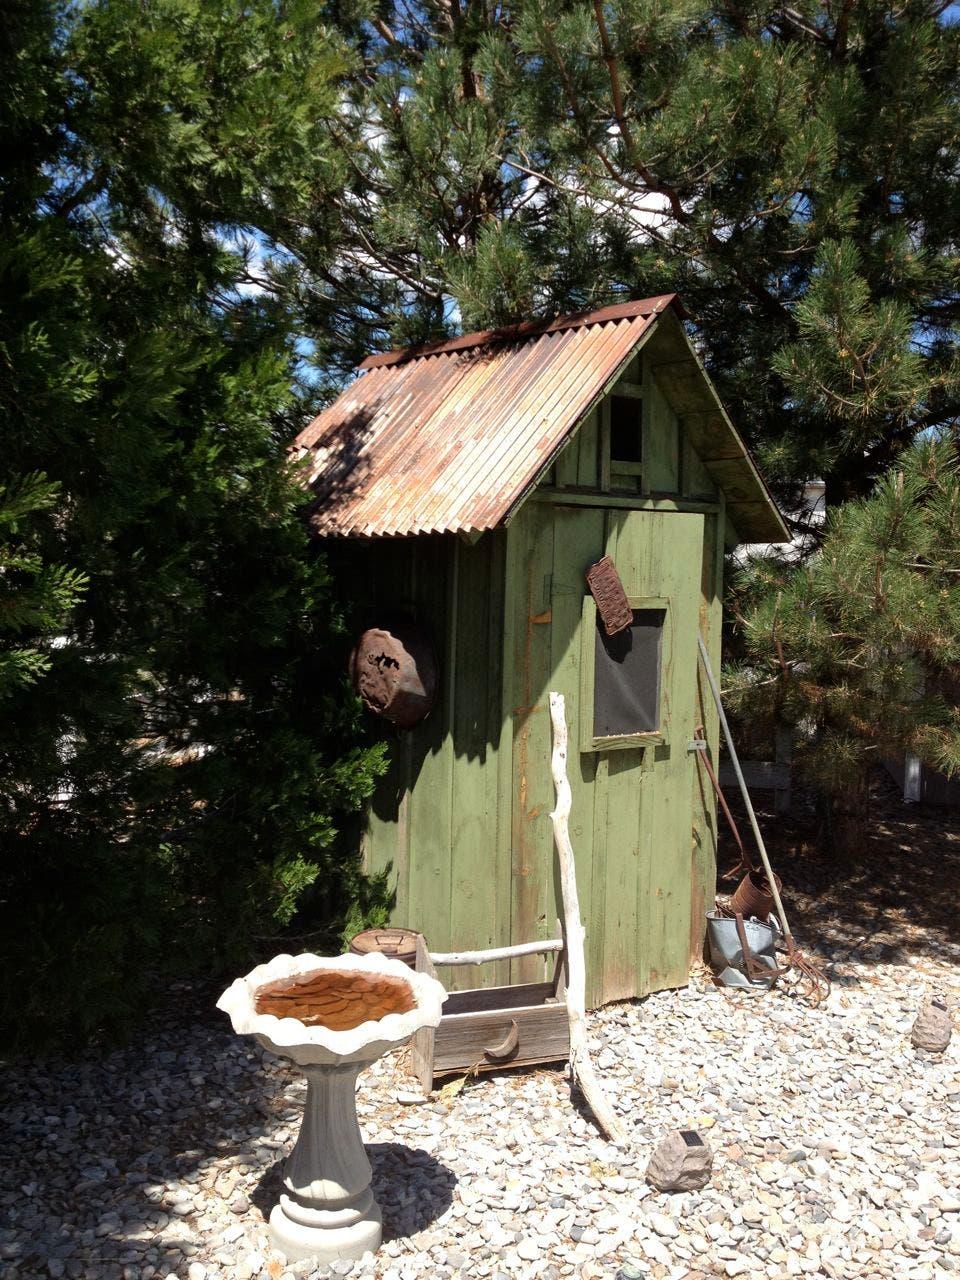 Julies Sheep Wagon Tiny House Blog